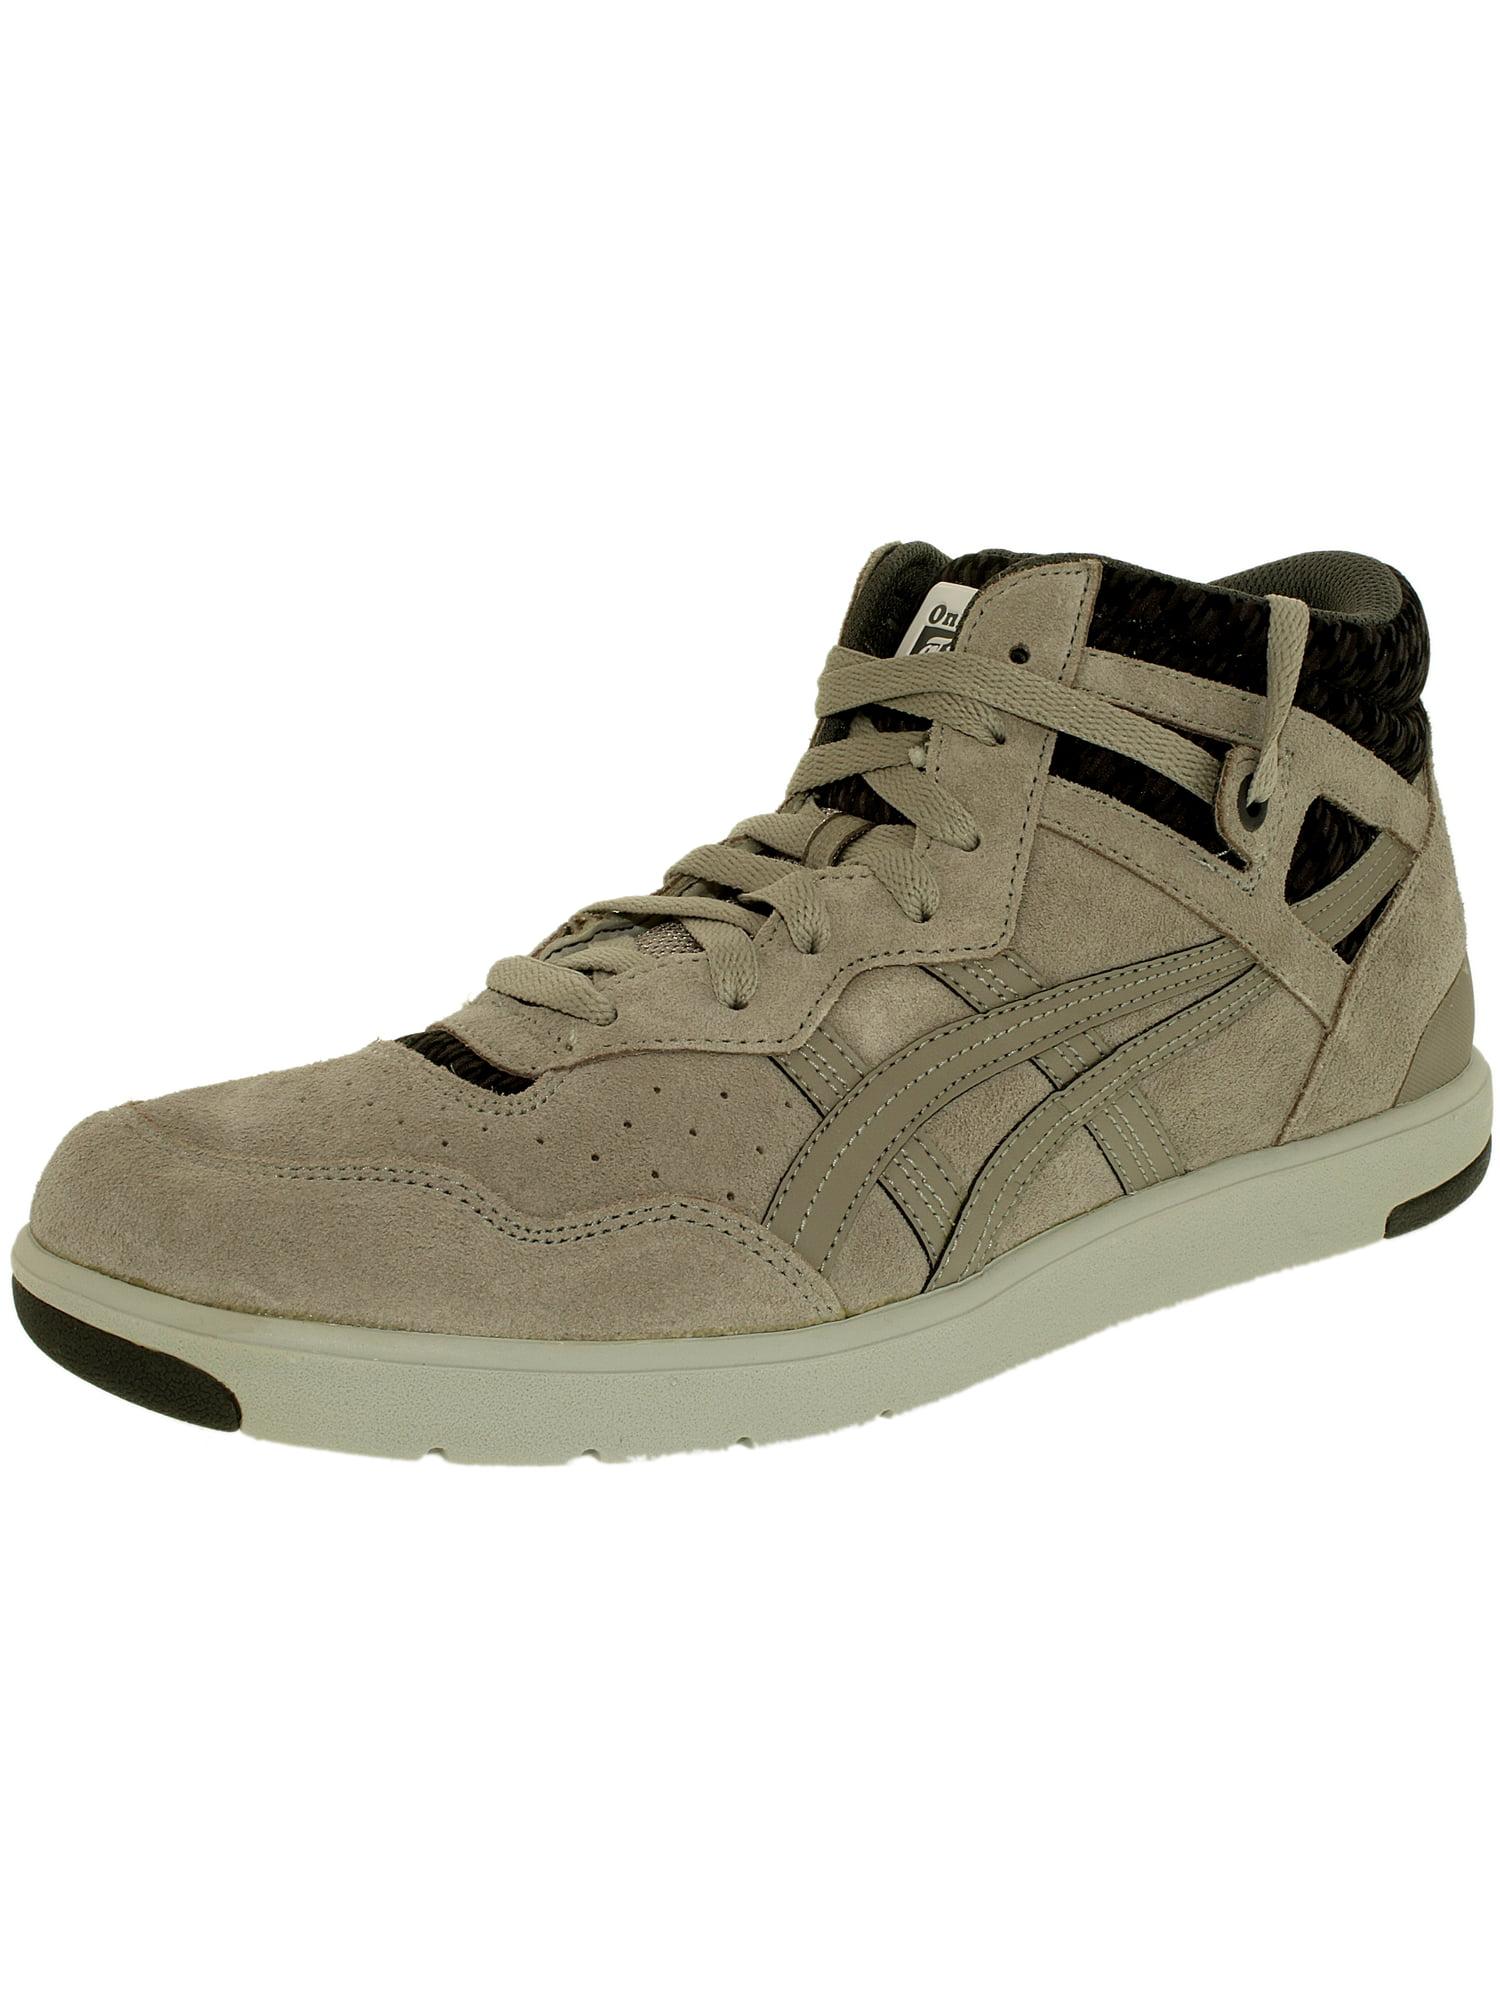 Onitsuka Tiger Women's Tustin Light Grey/Light Grey Ankle-High Leather Fashion Sneaker - 9.5M